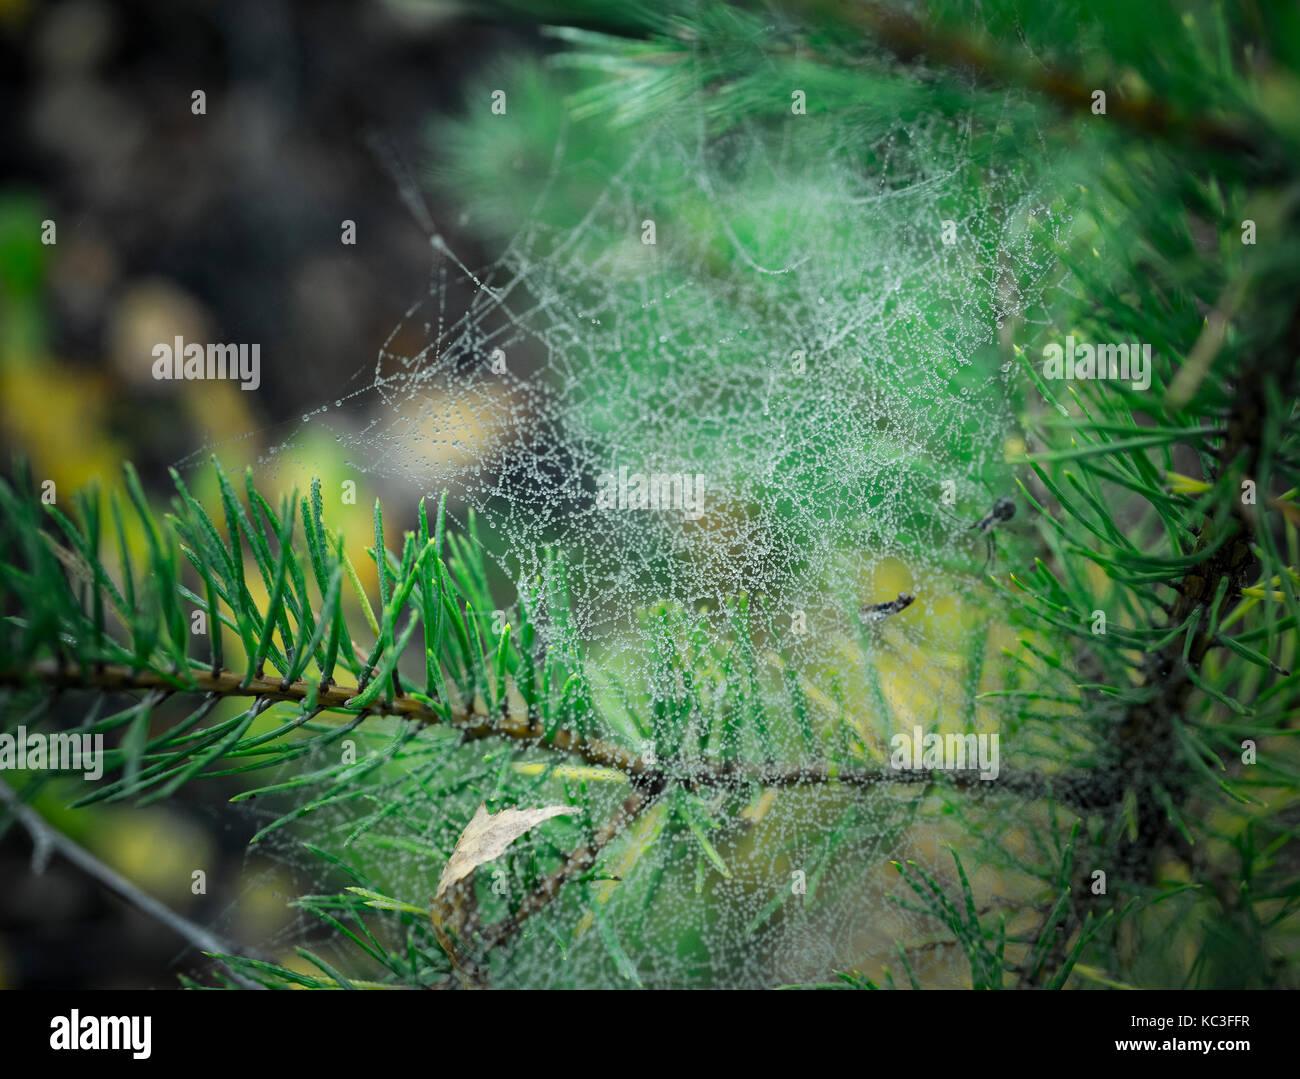 cobweb on a spruce twig - Stock Image